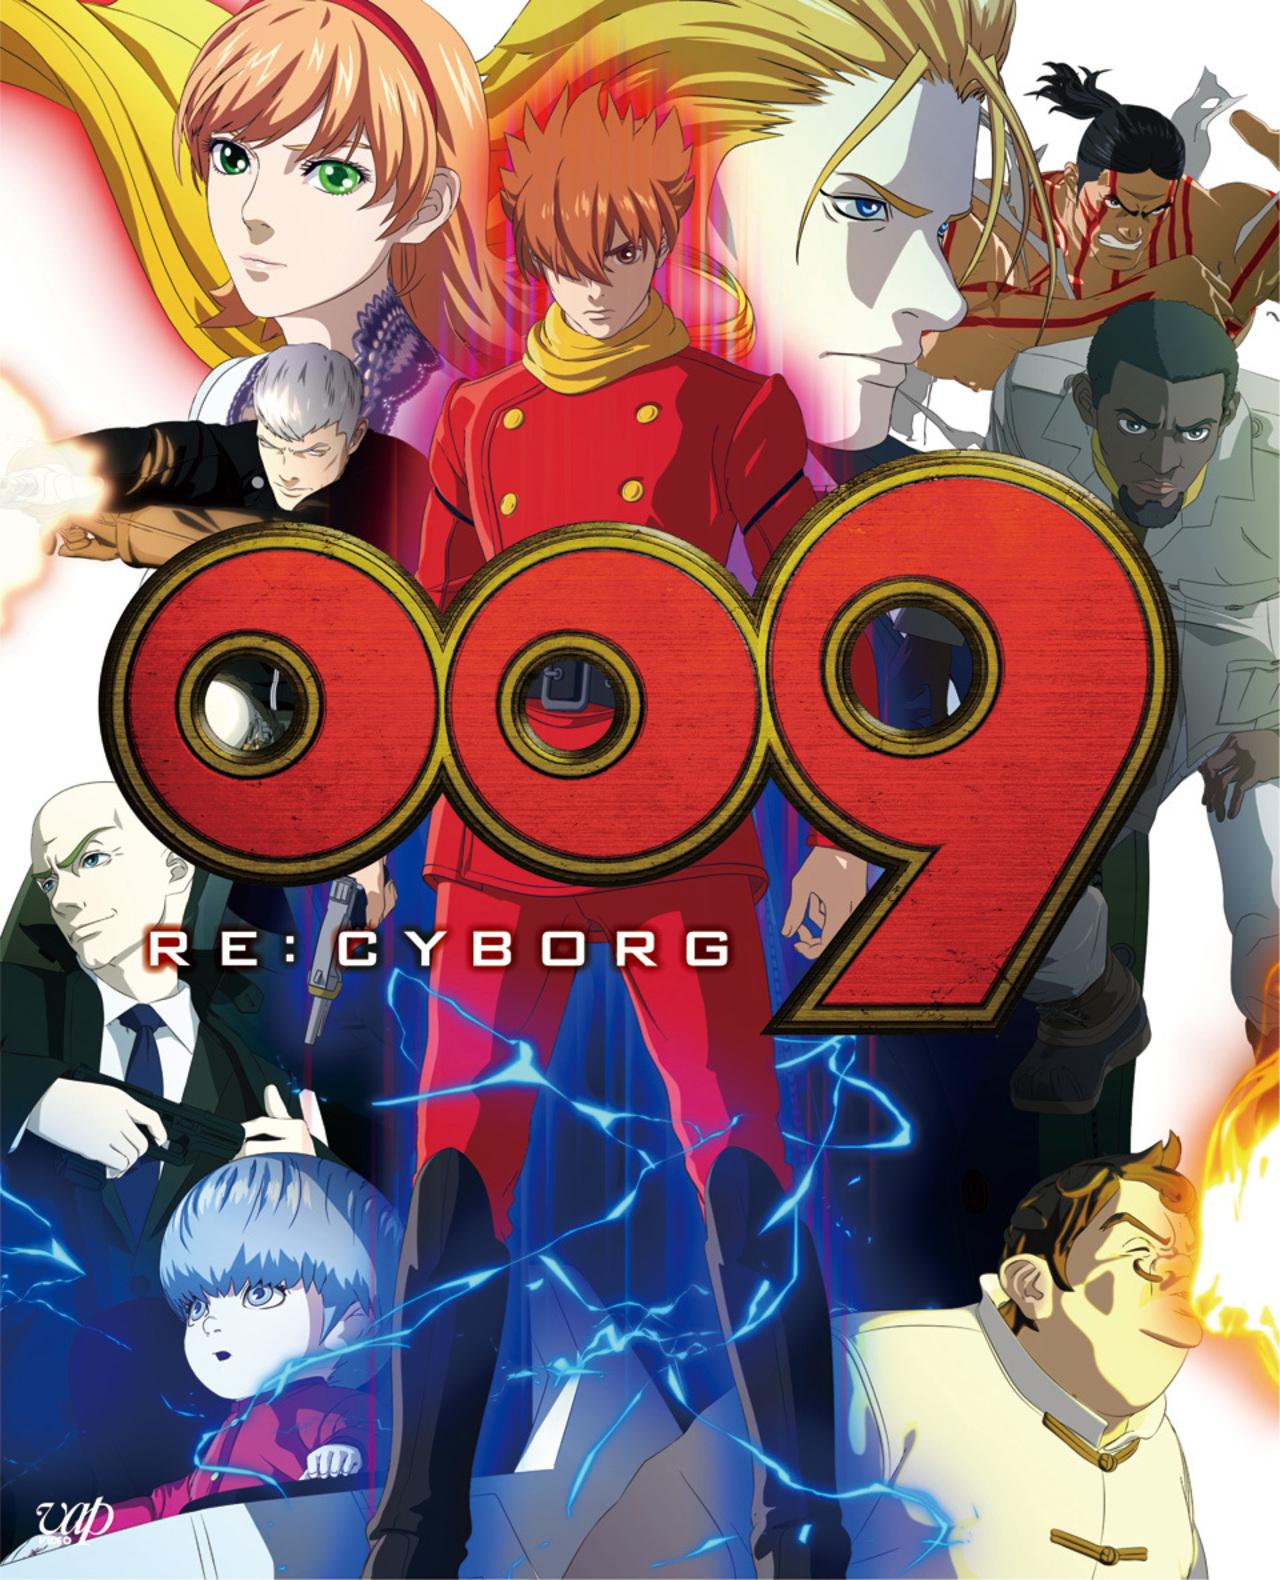 009 Re: Cyborg kapak